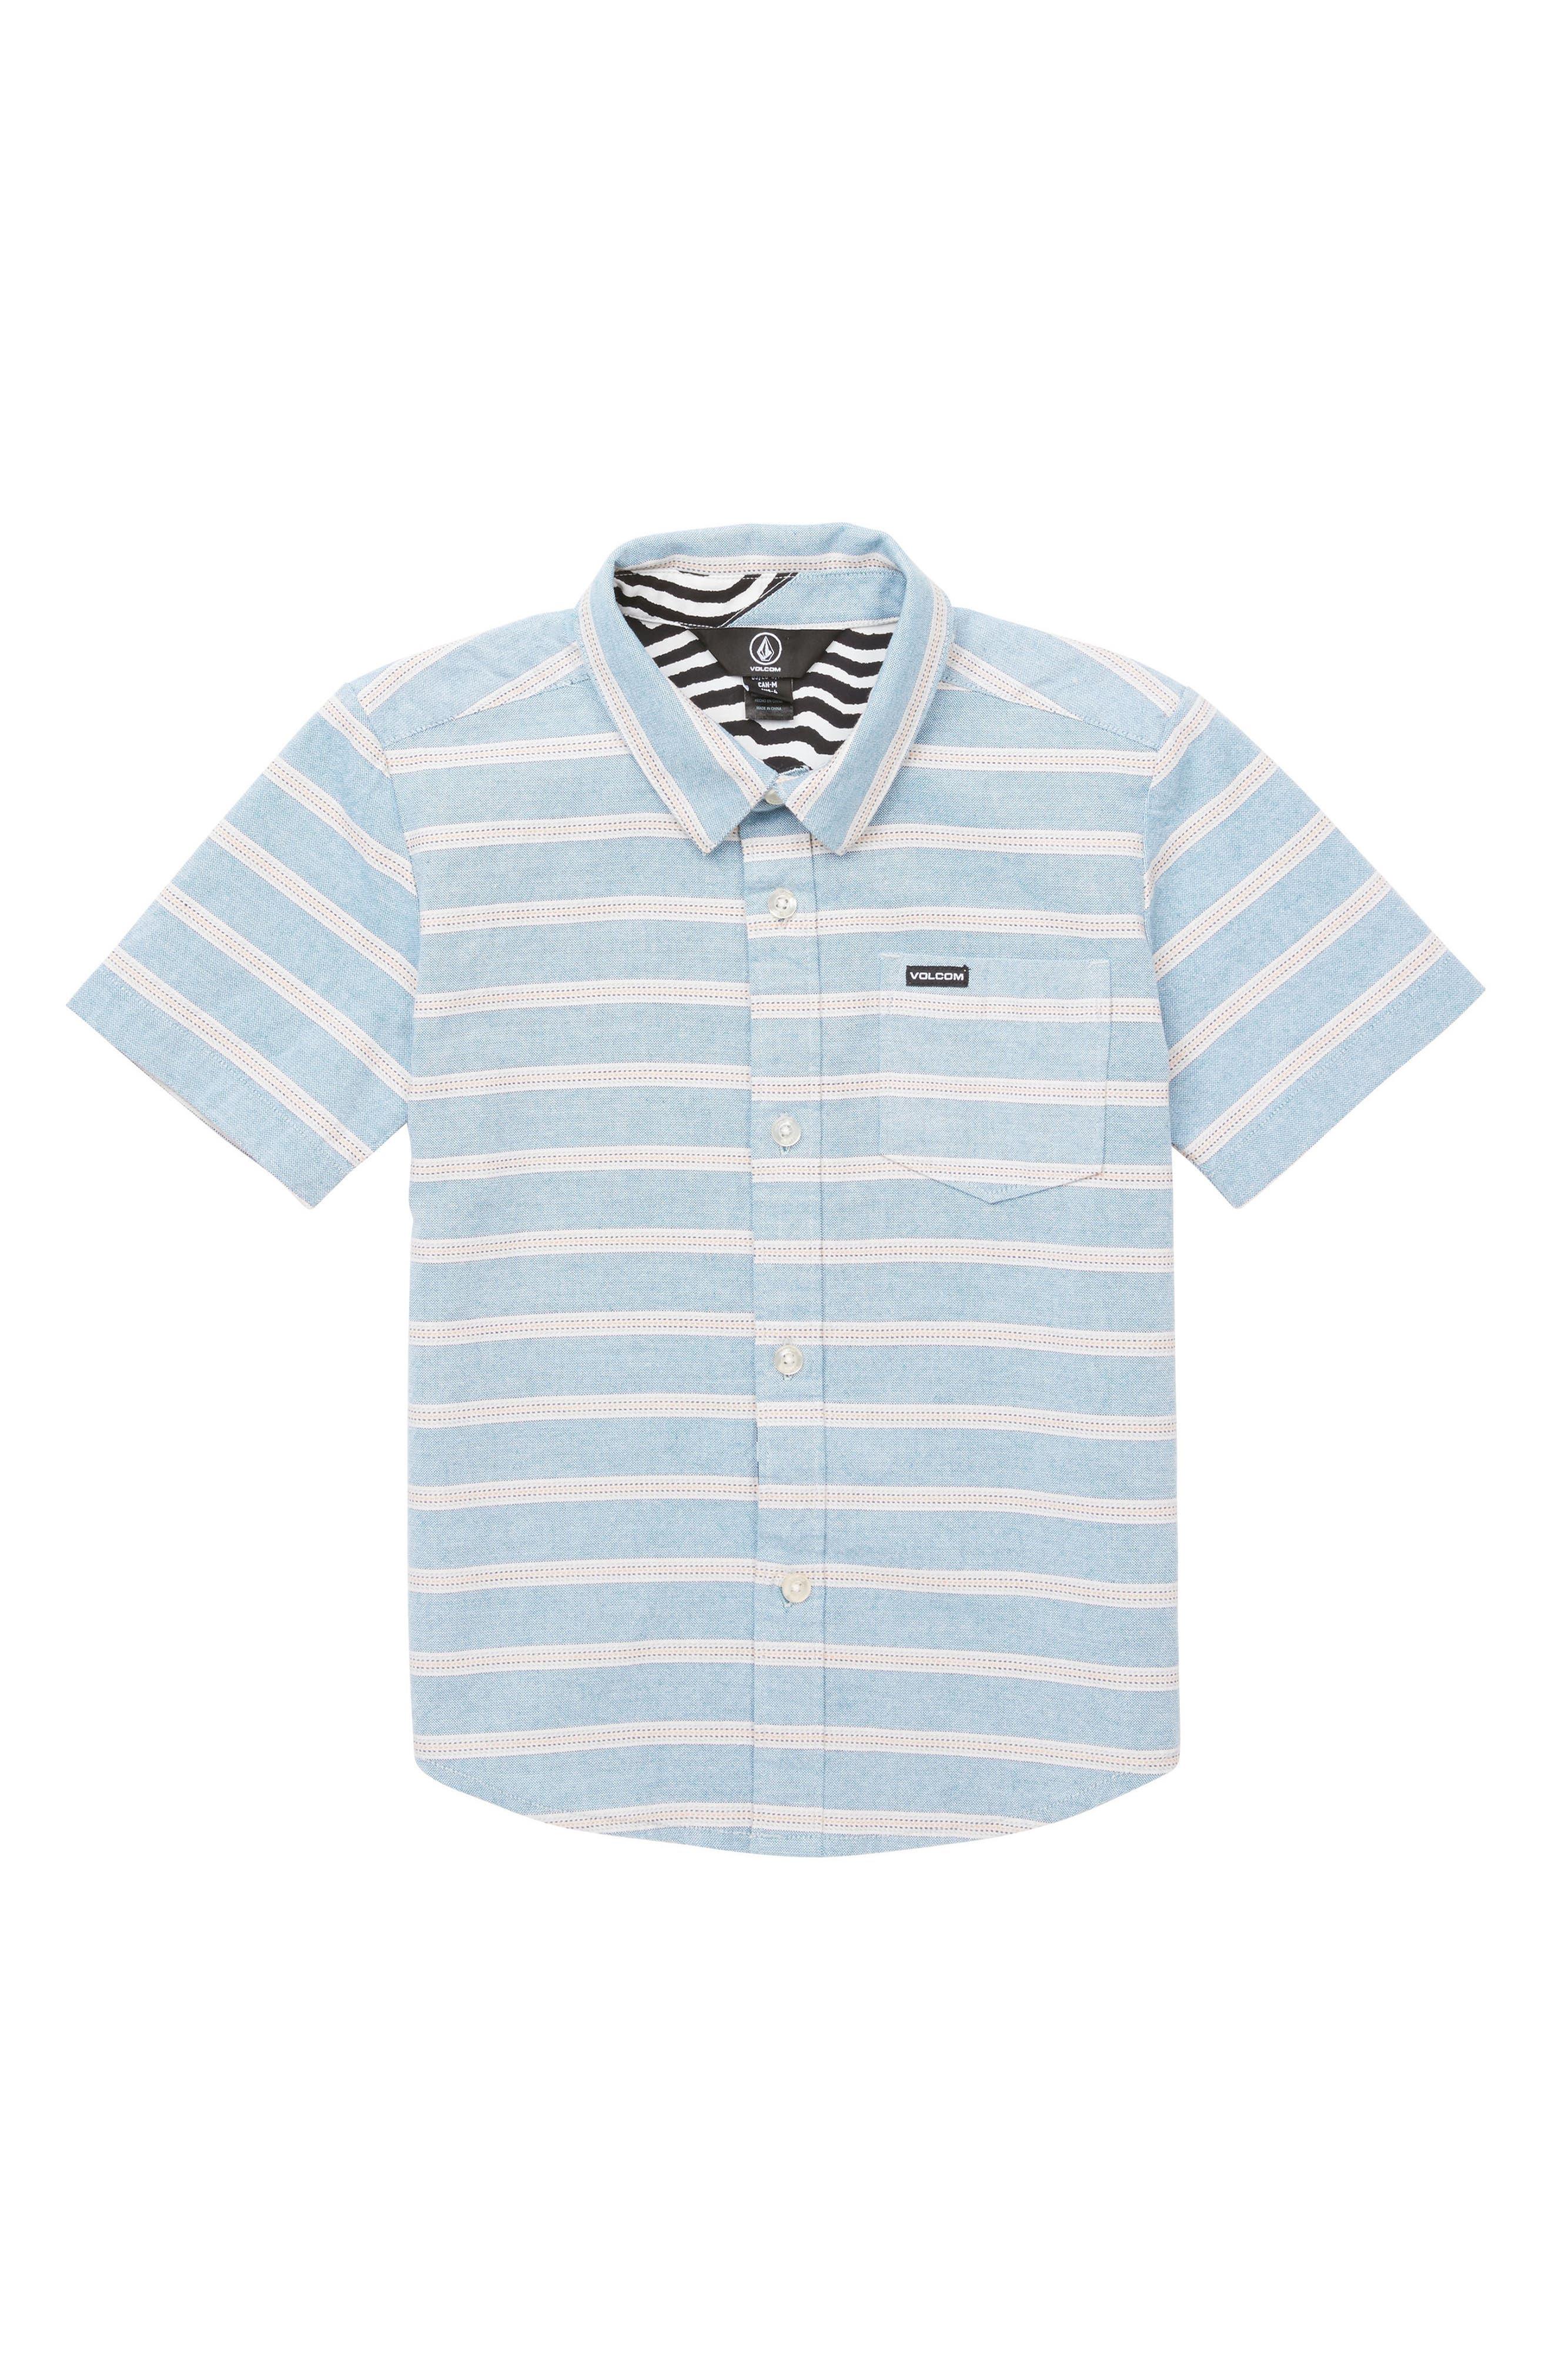 Branson Stripe Woven Shirt,                             Main thumbnail 1, color,                             Vintage Blue